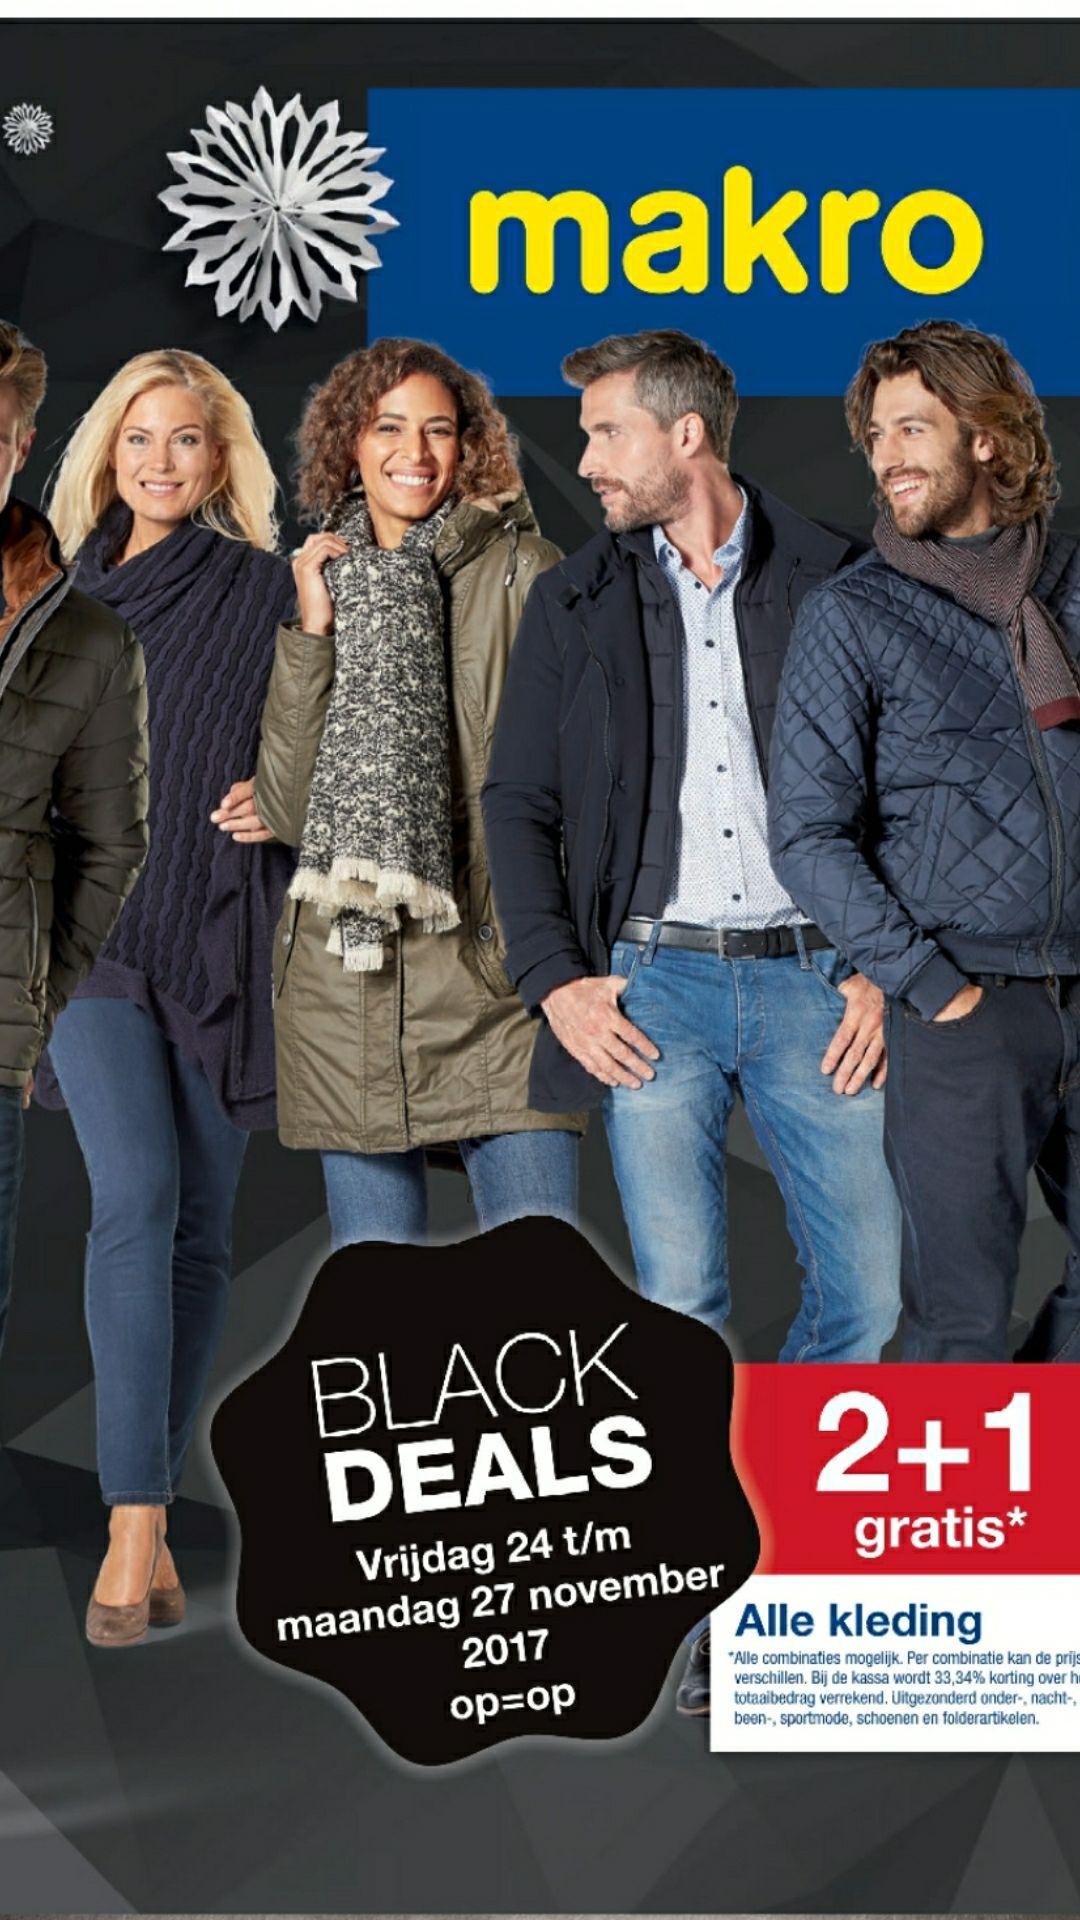 Makro Black Deals 2+1 gratis op alle kleding!